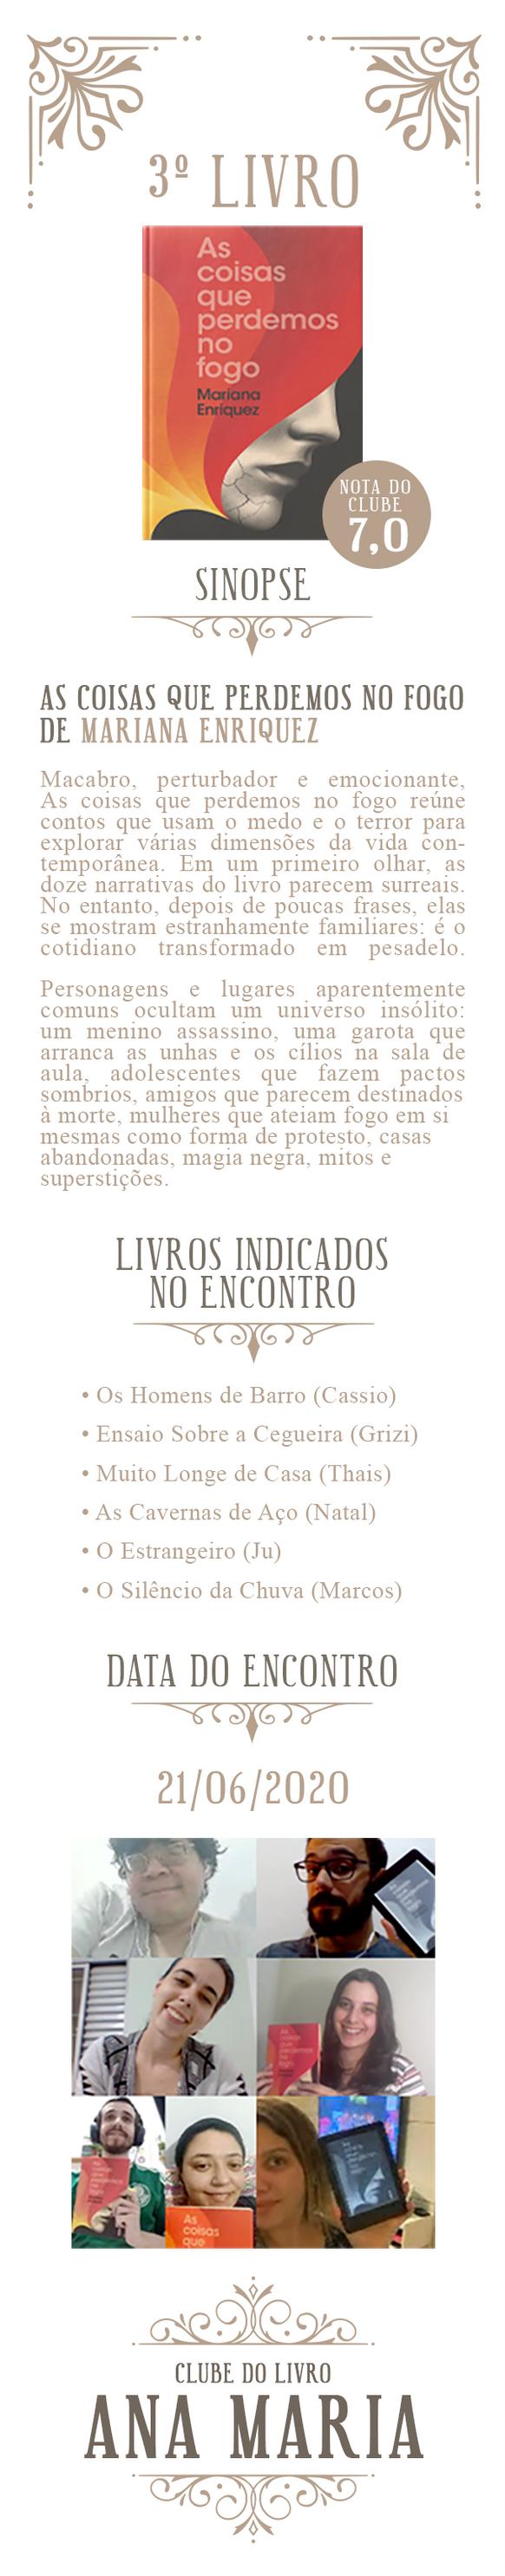 livro-3.png